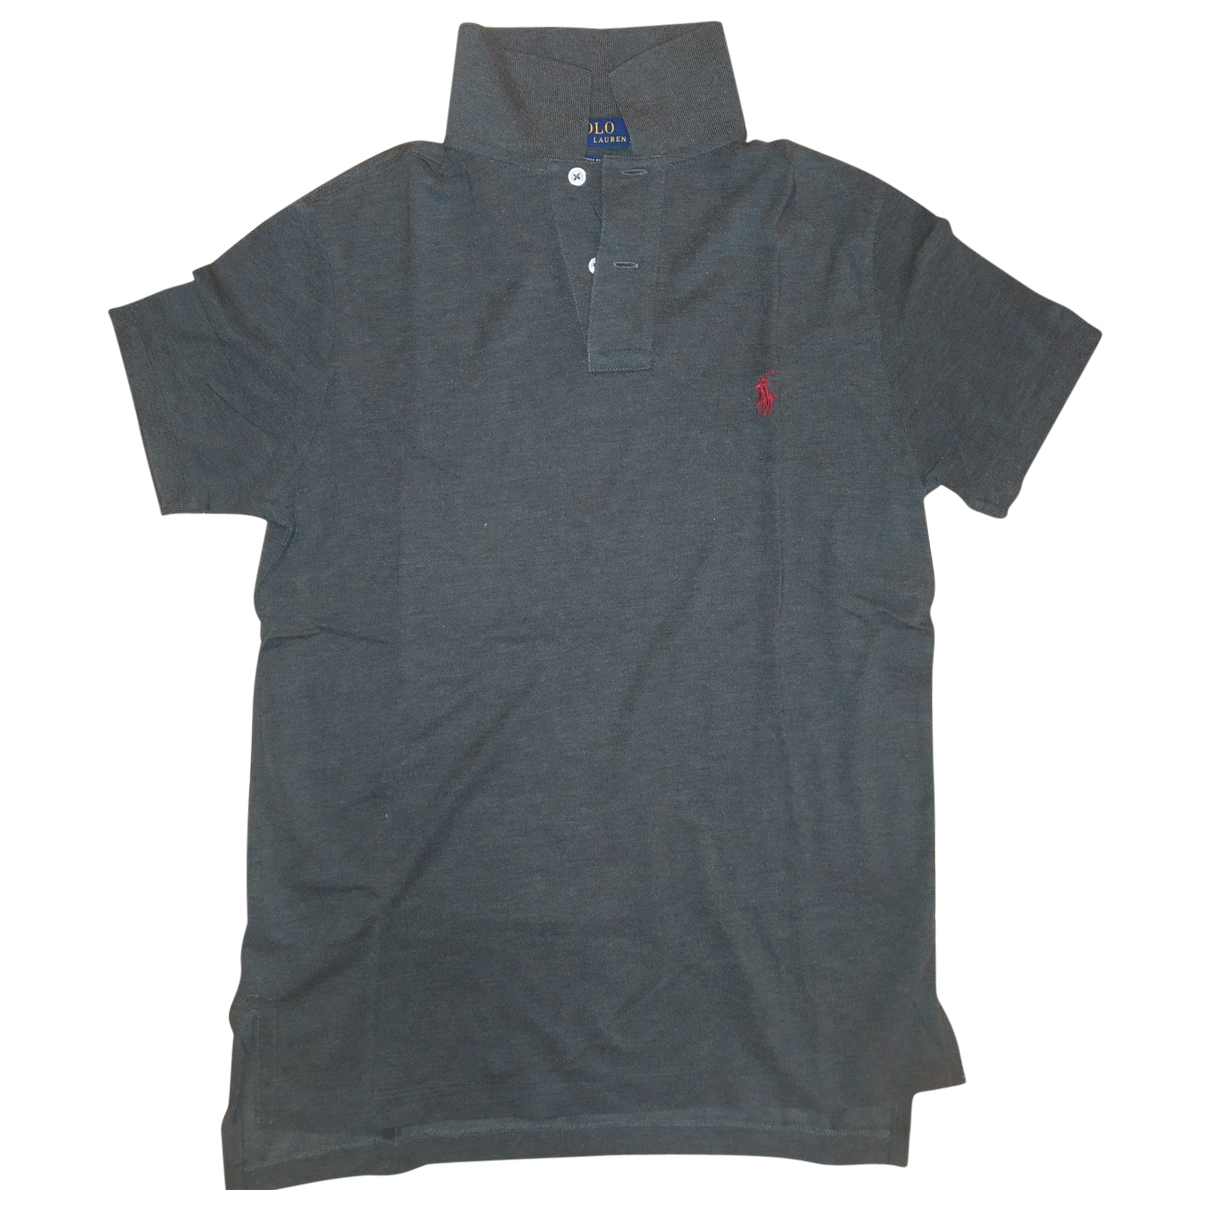 Polo Ralph Lauren \N Grey Cotton Polo shirts for Men S International